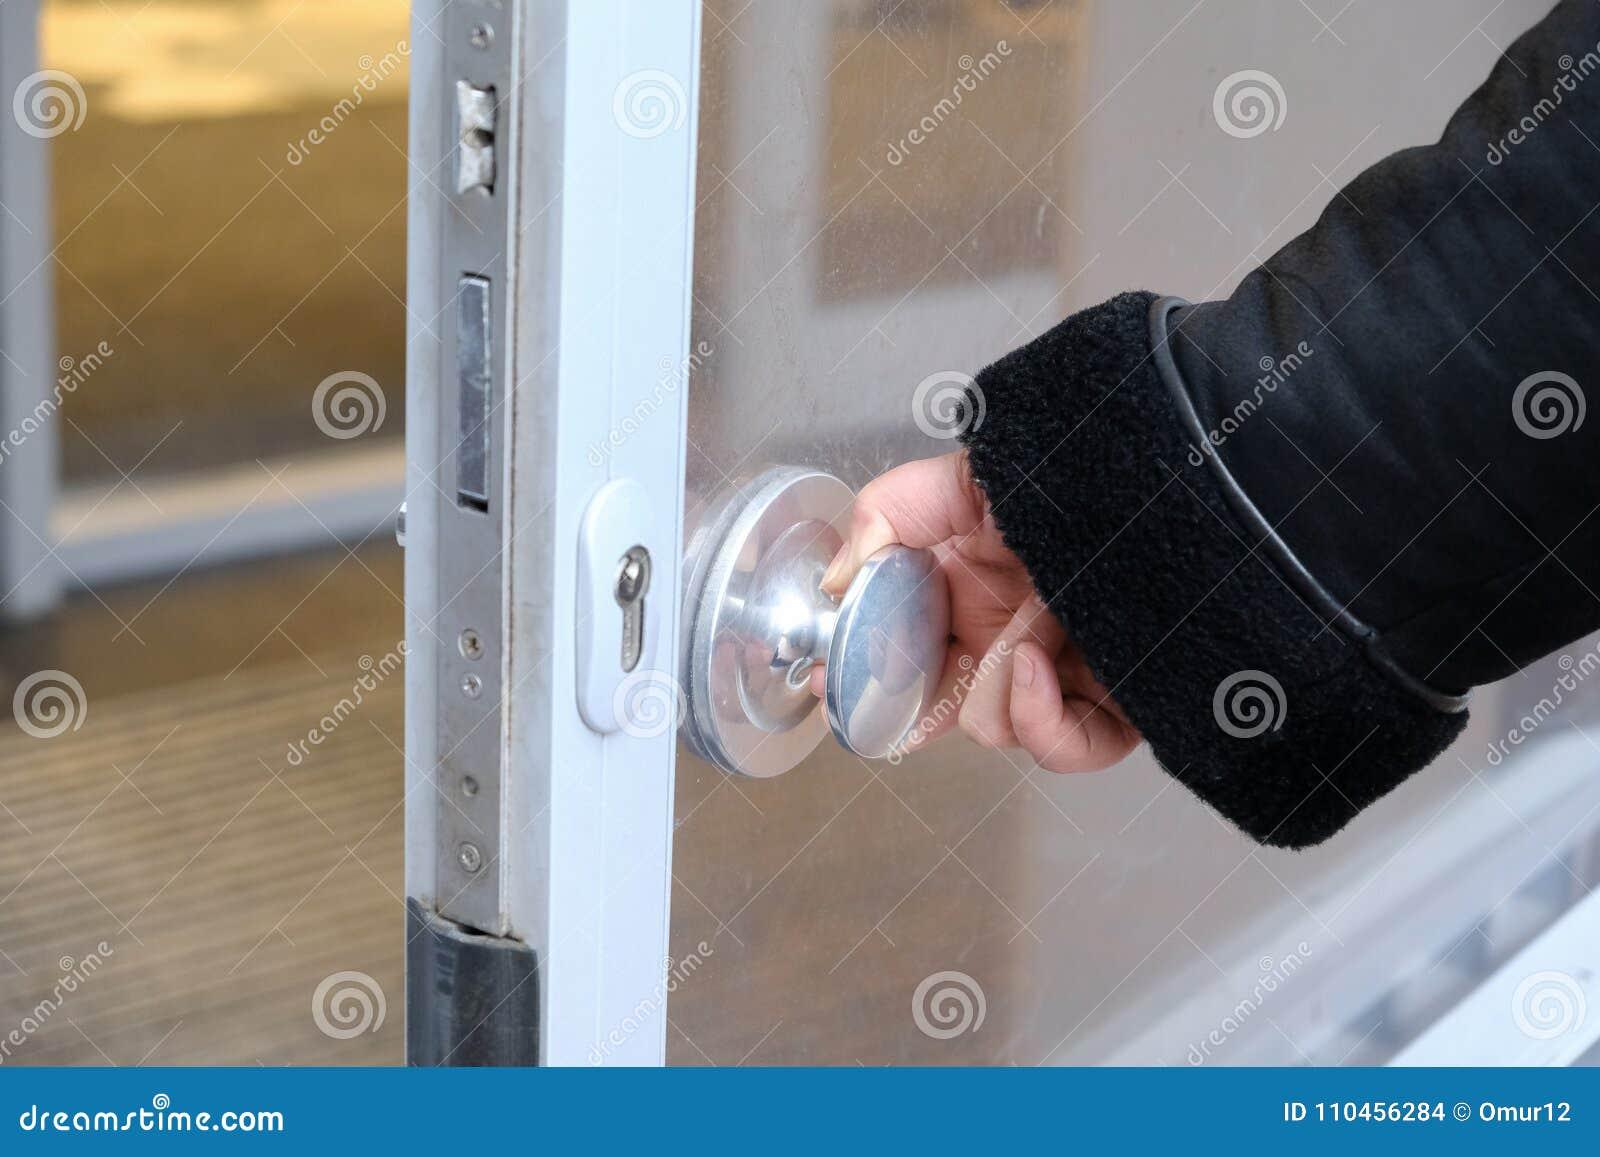 Handen öppnar dörren vid handtaget